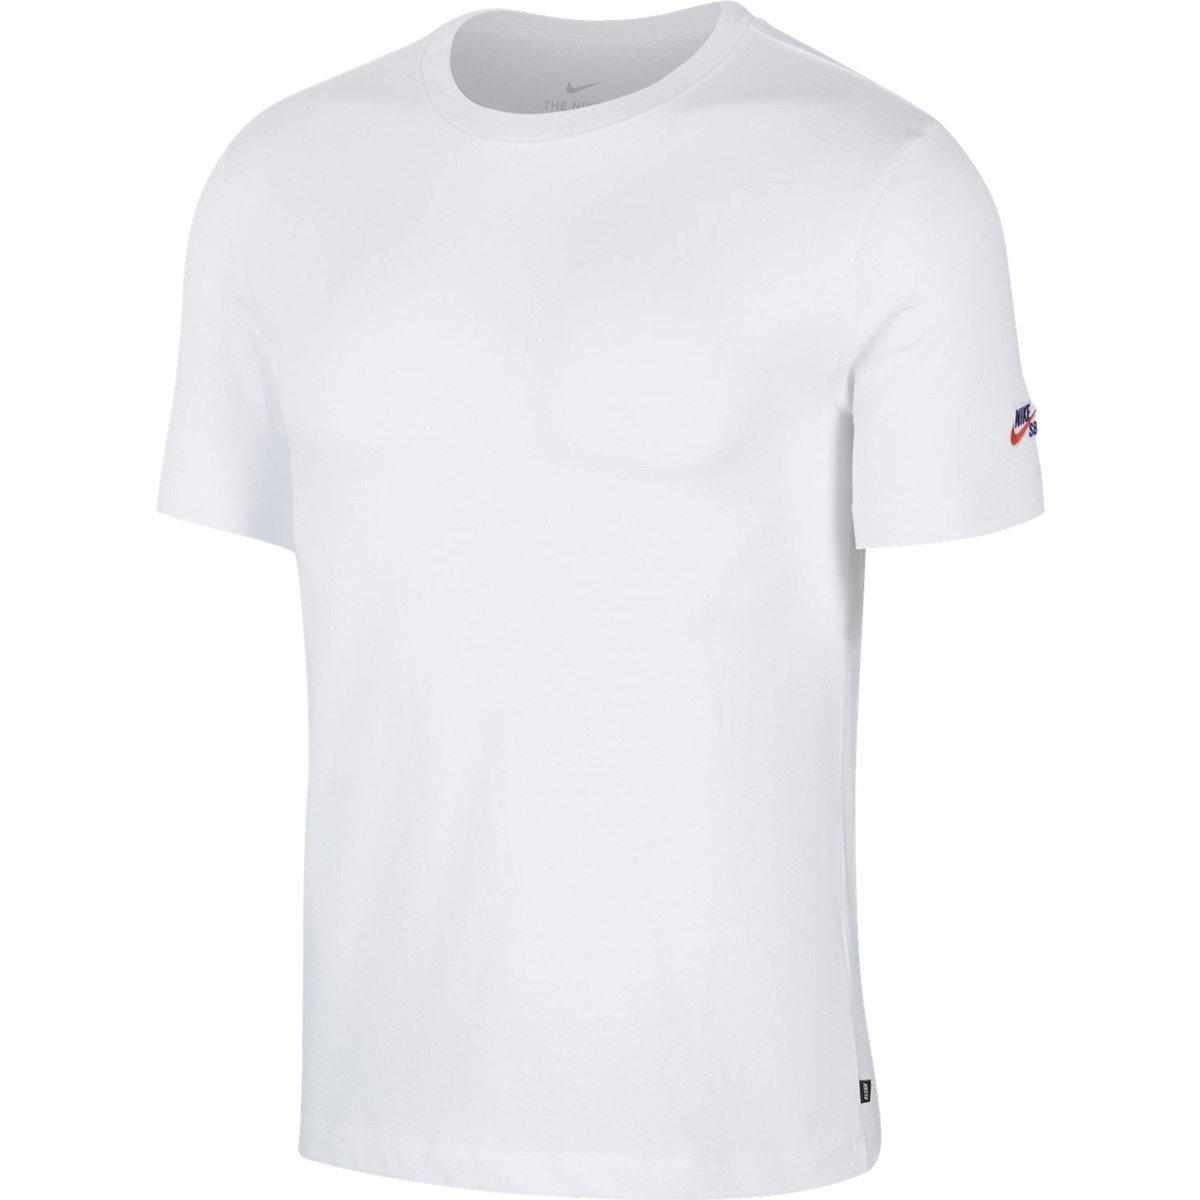 65438f8a t shirt Nike Sb Tee Essential white white | Clothes \ T-shirts \ T ...